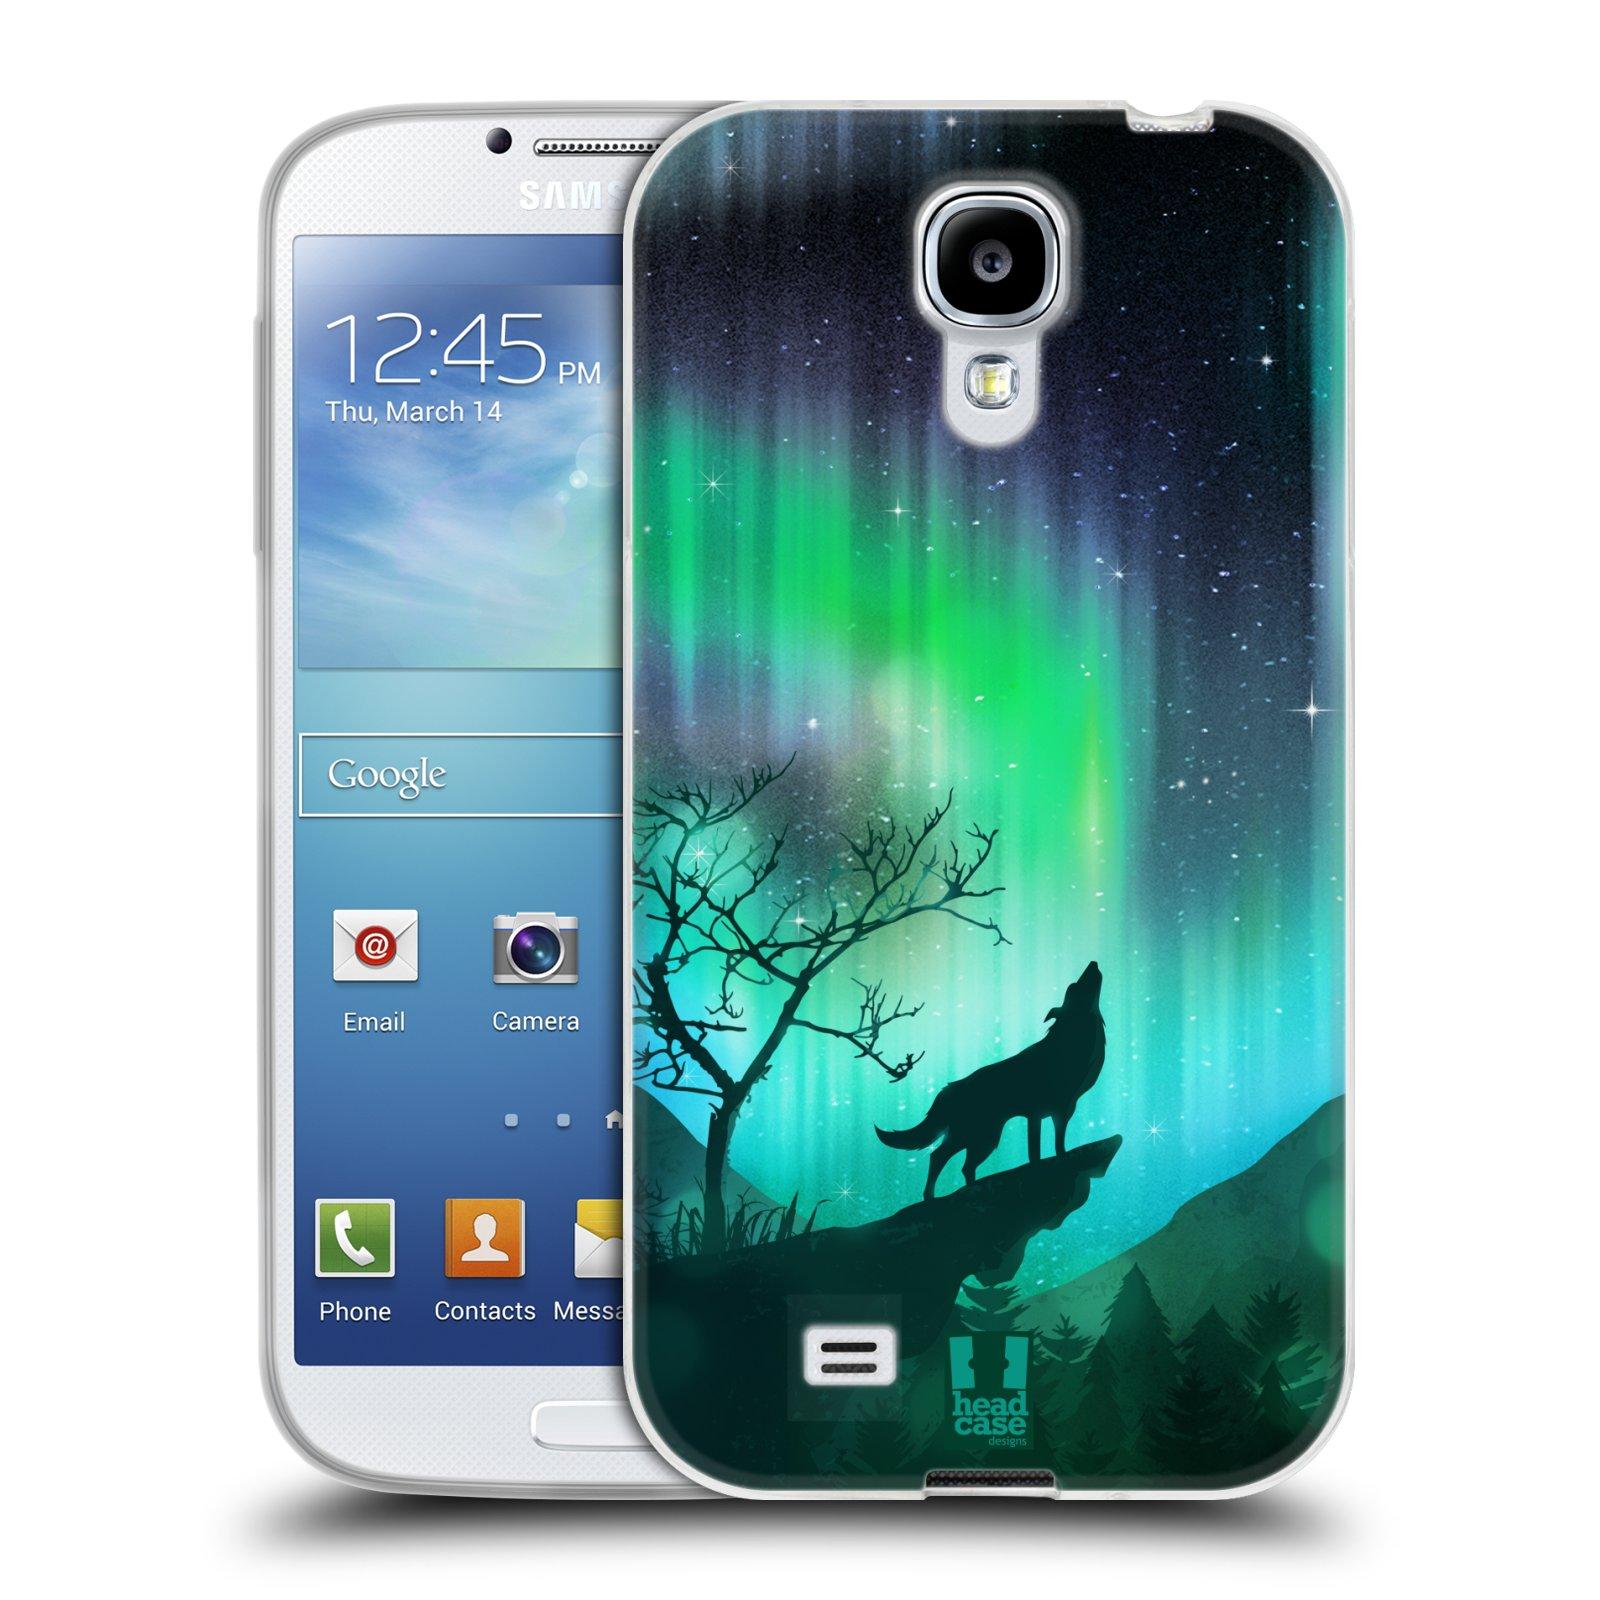 Silikonové pouzdro na mobil Samsung Galaxy S4 HEAD CASE Polární Záře Vlk (Silikonový kryt či obal na mobilní telefon Samsung Galaxy S4 GT-i9505 / i9500)